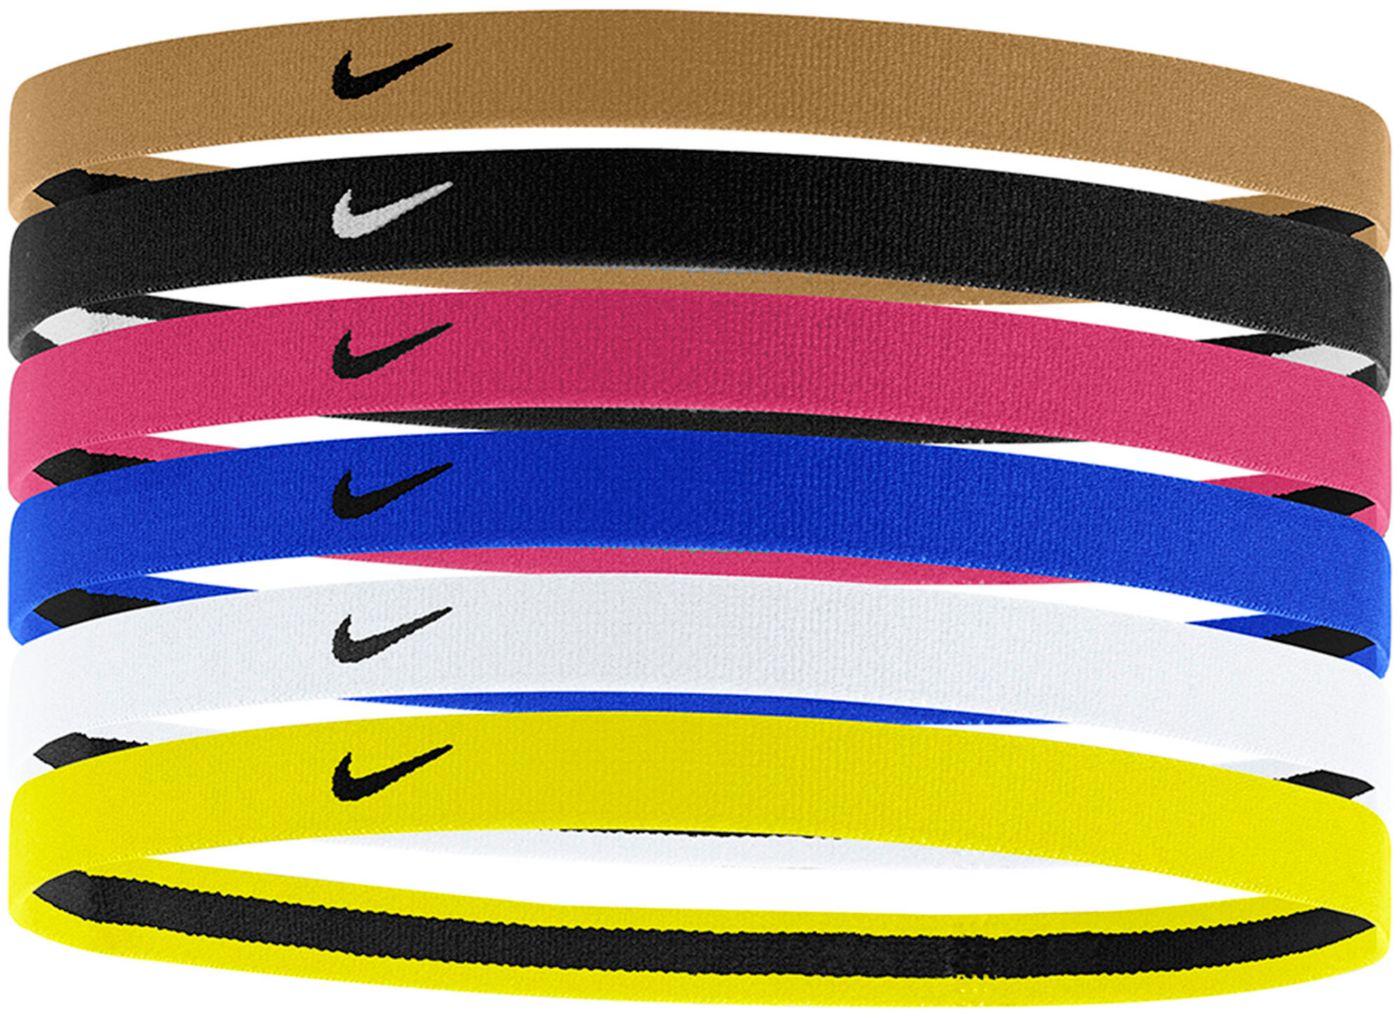 Nike Women's Assorted Headbands – 6 Pack